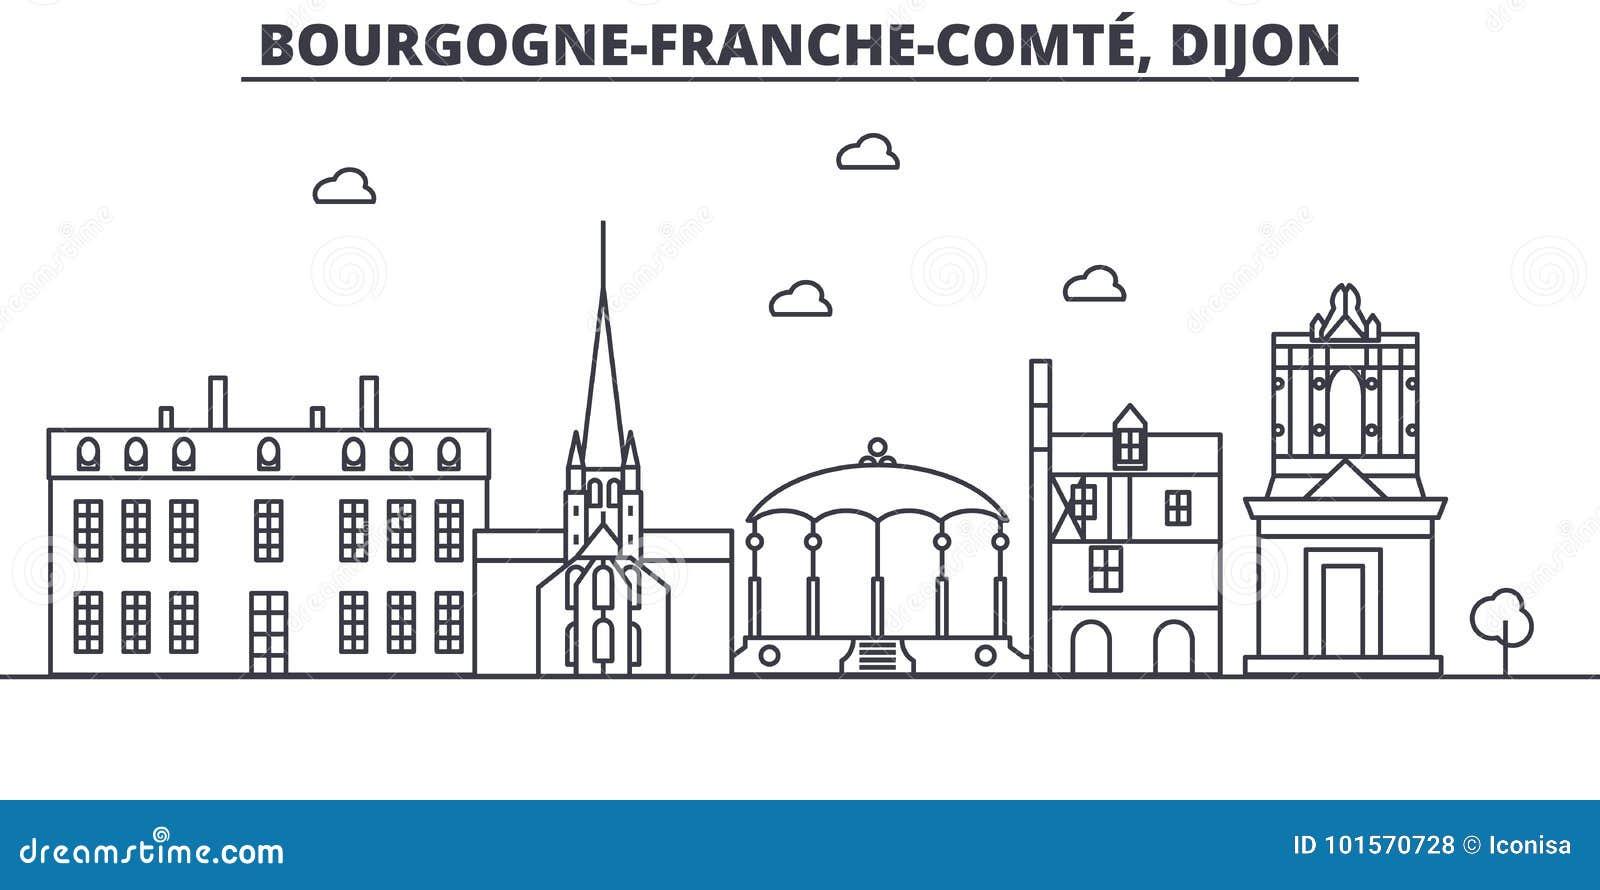 France dijon architecture line skyline illustration for Dijon architecture